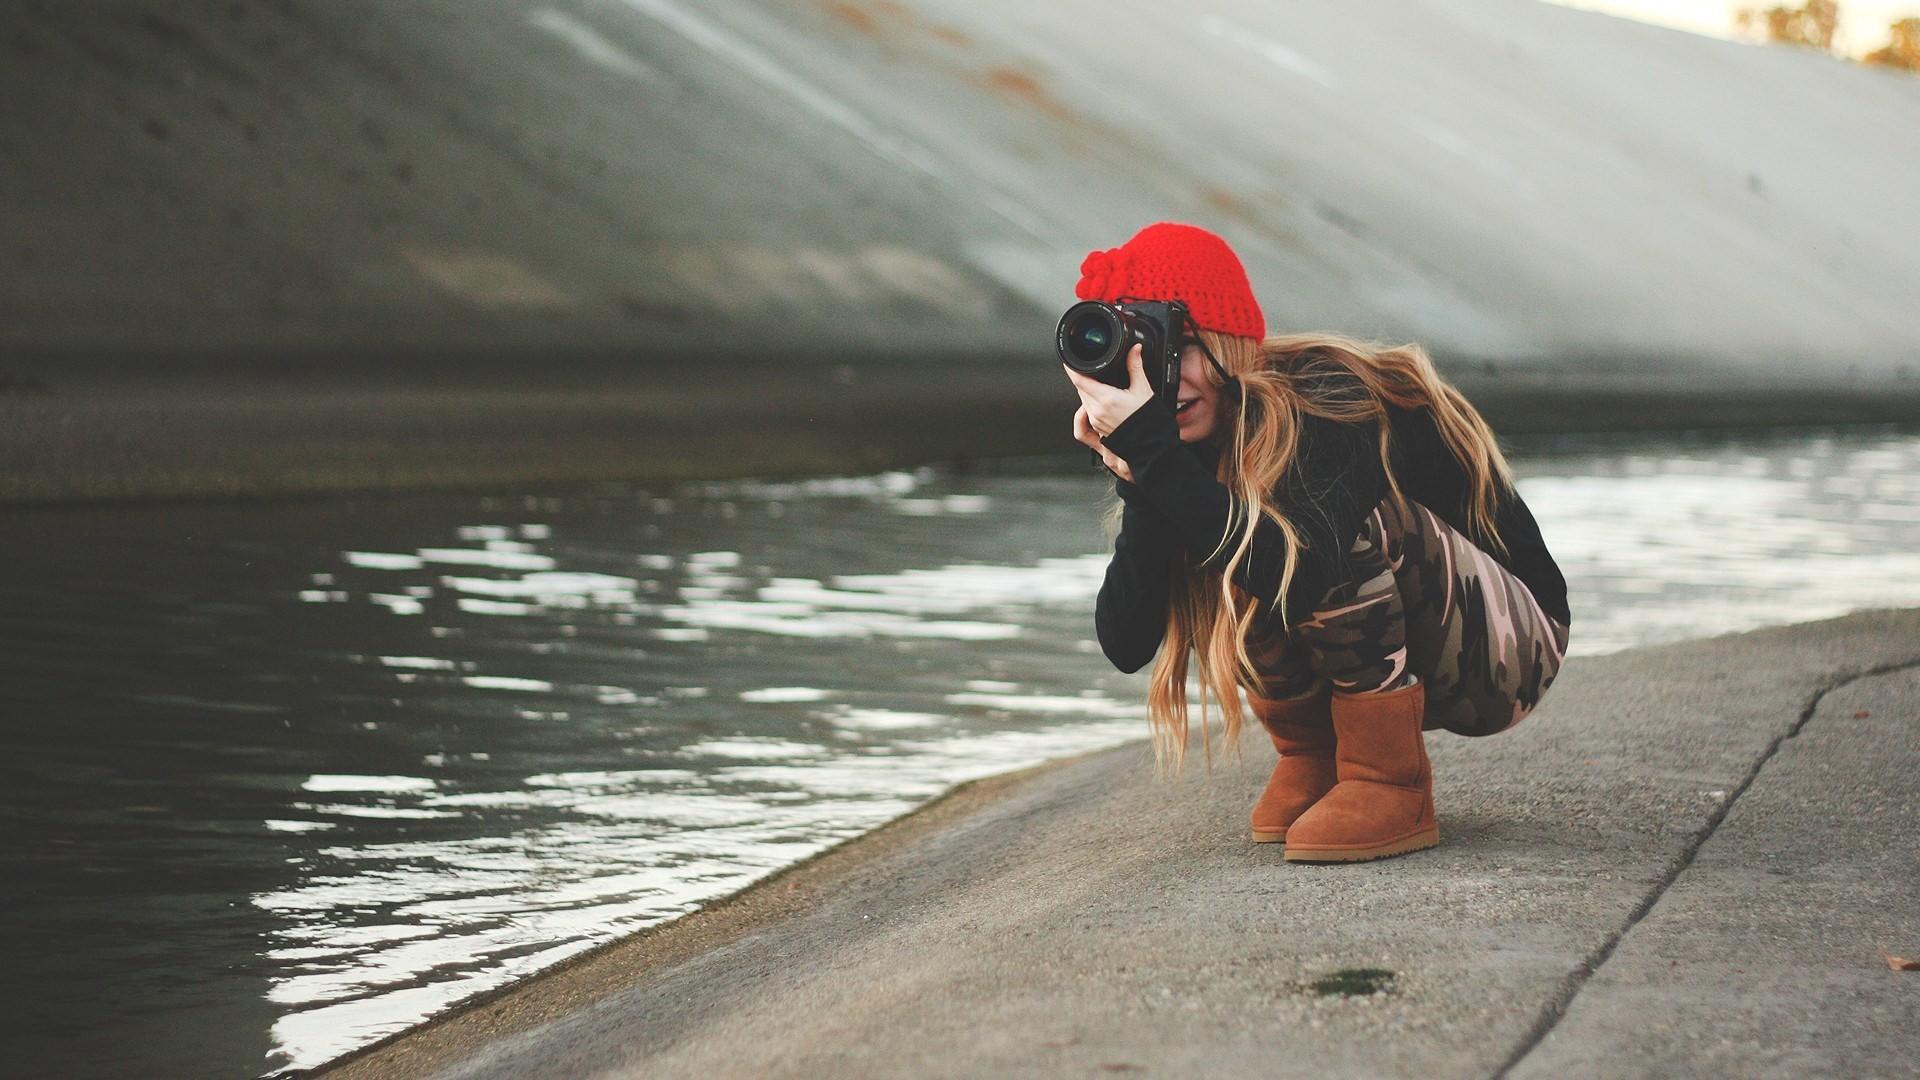 Water Girl Mood Wallpaper 43947